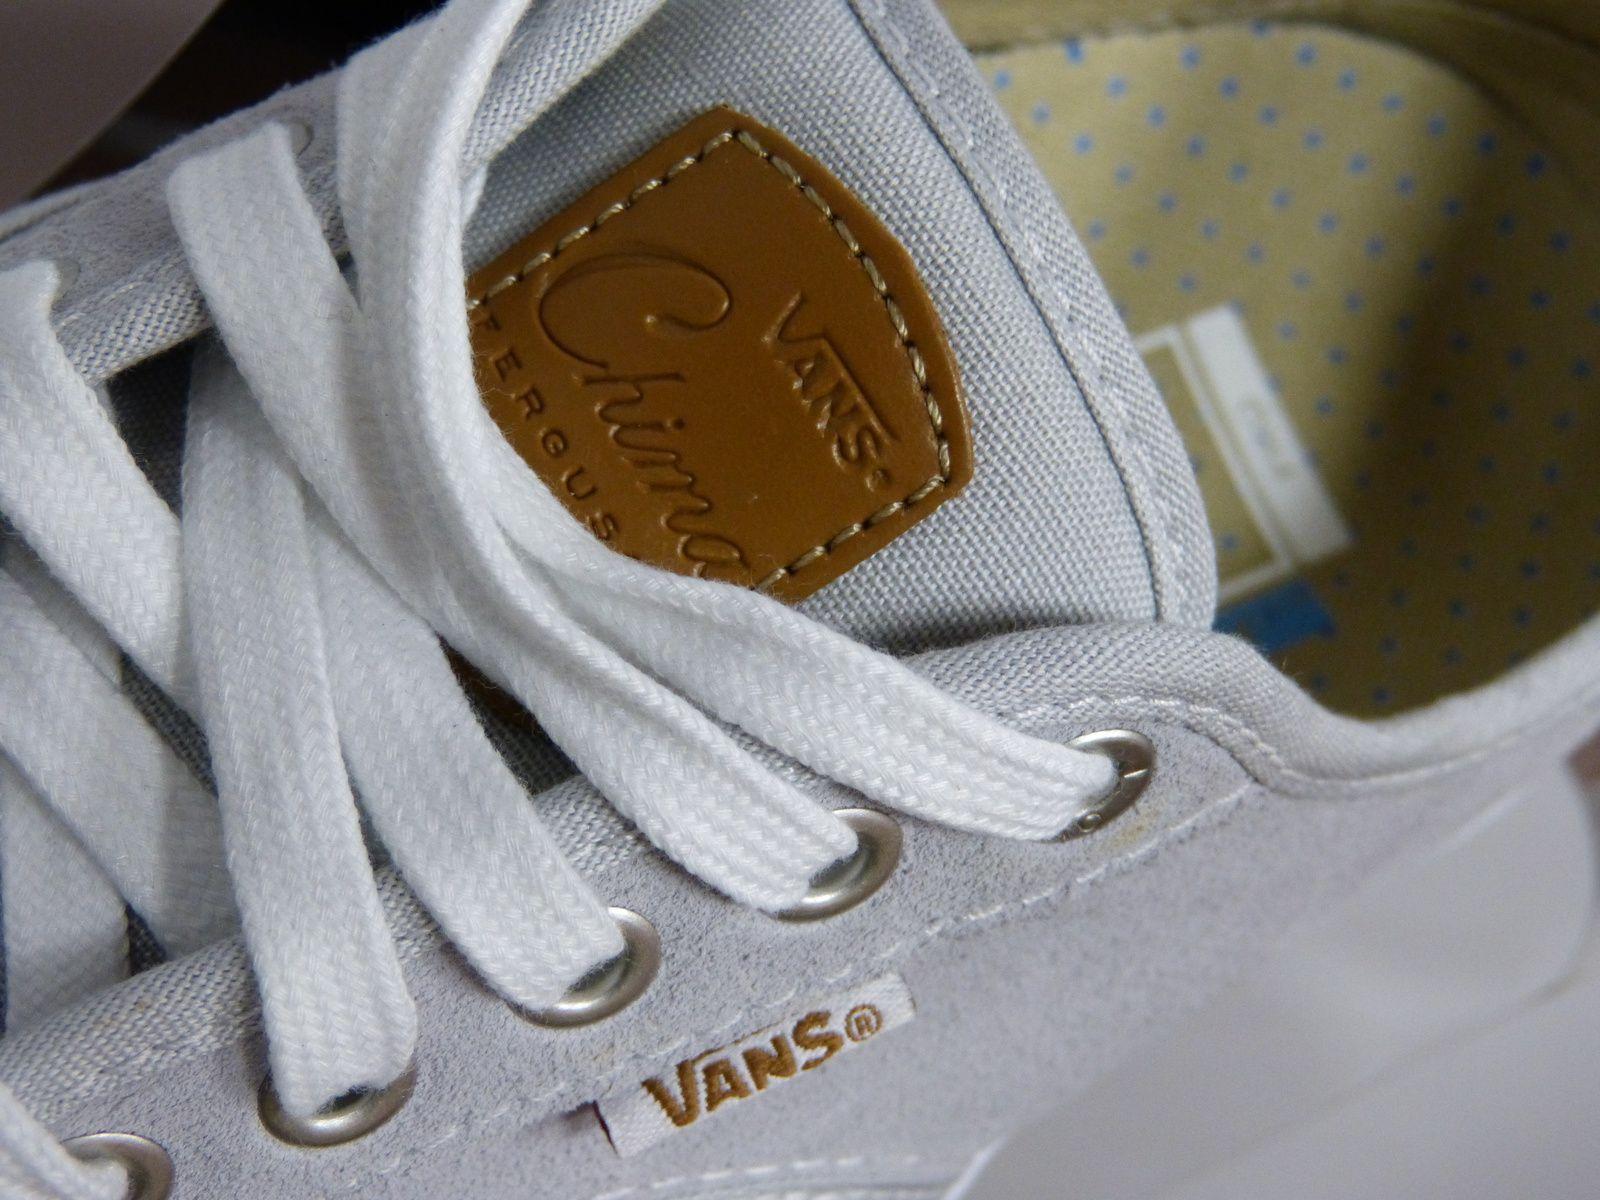 Vans Pro Skate spring 16